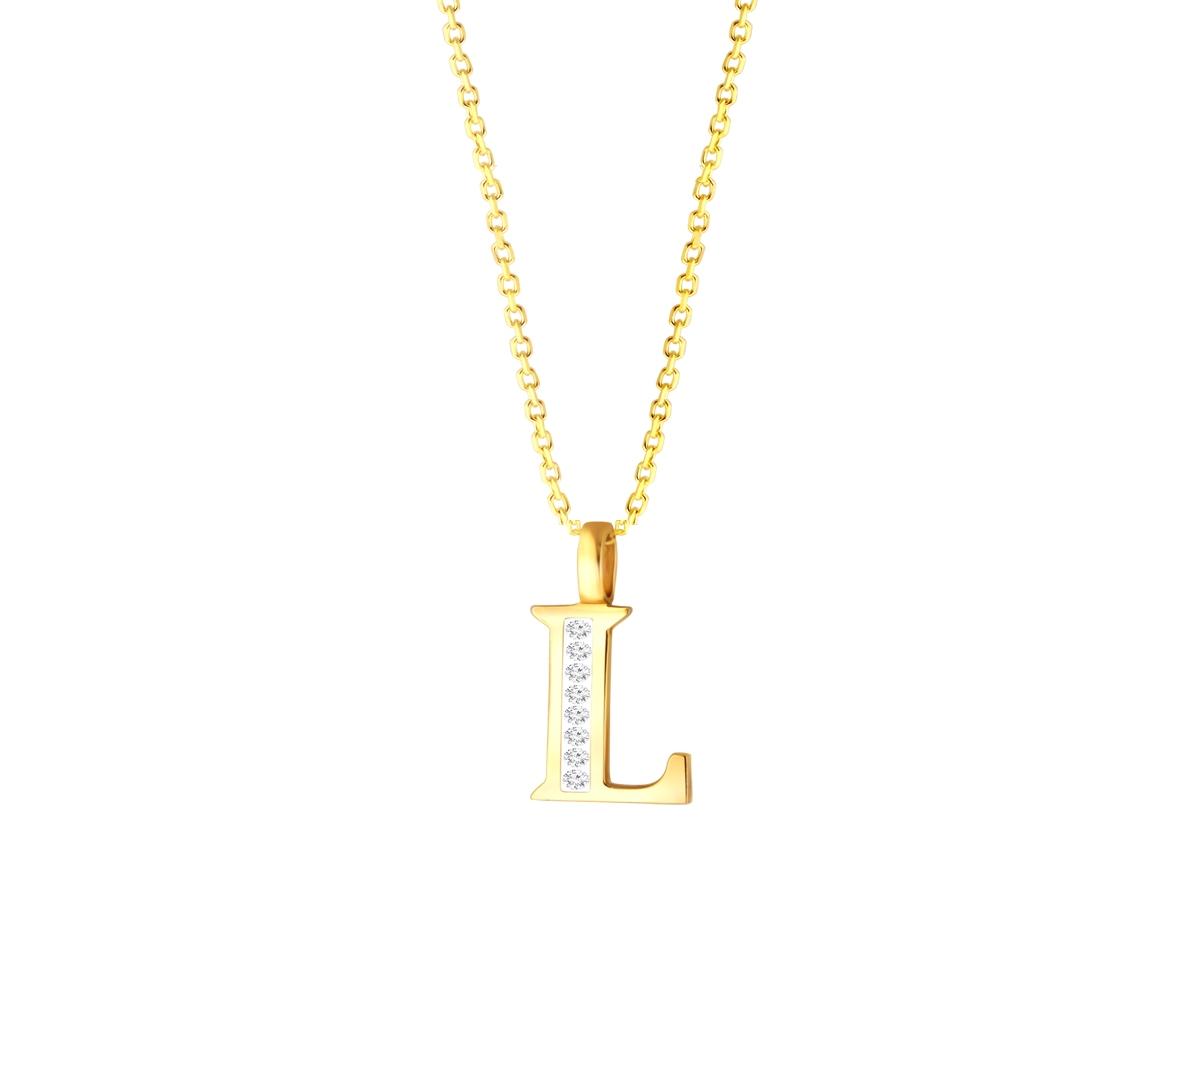 L' Alphabet Pendant chain with Diamonds